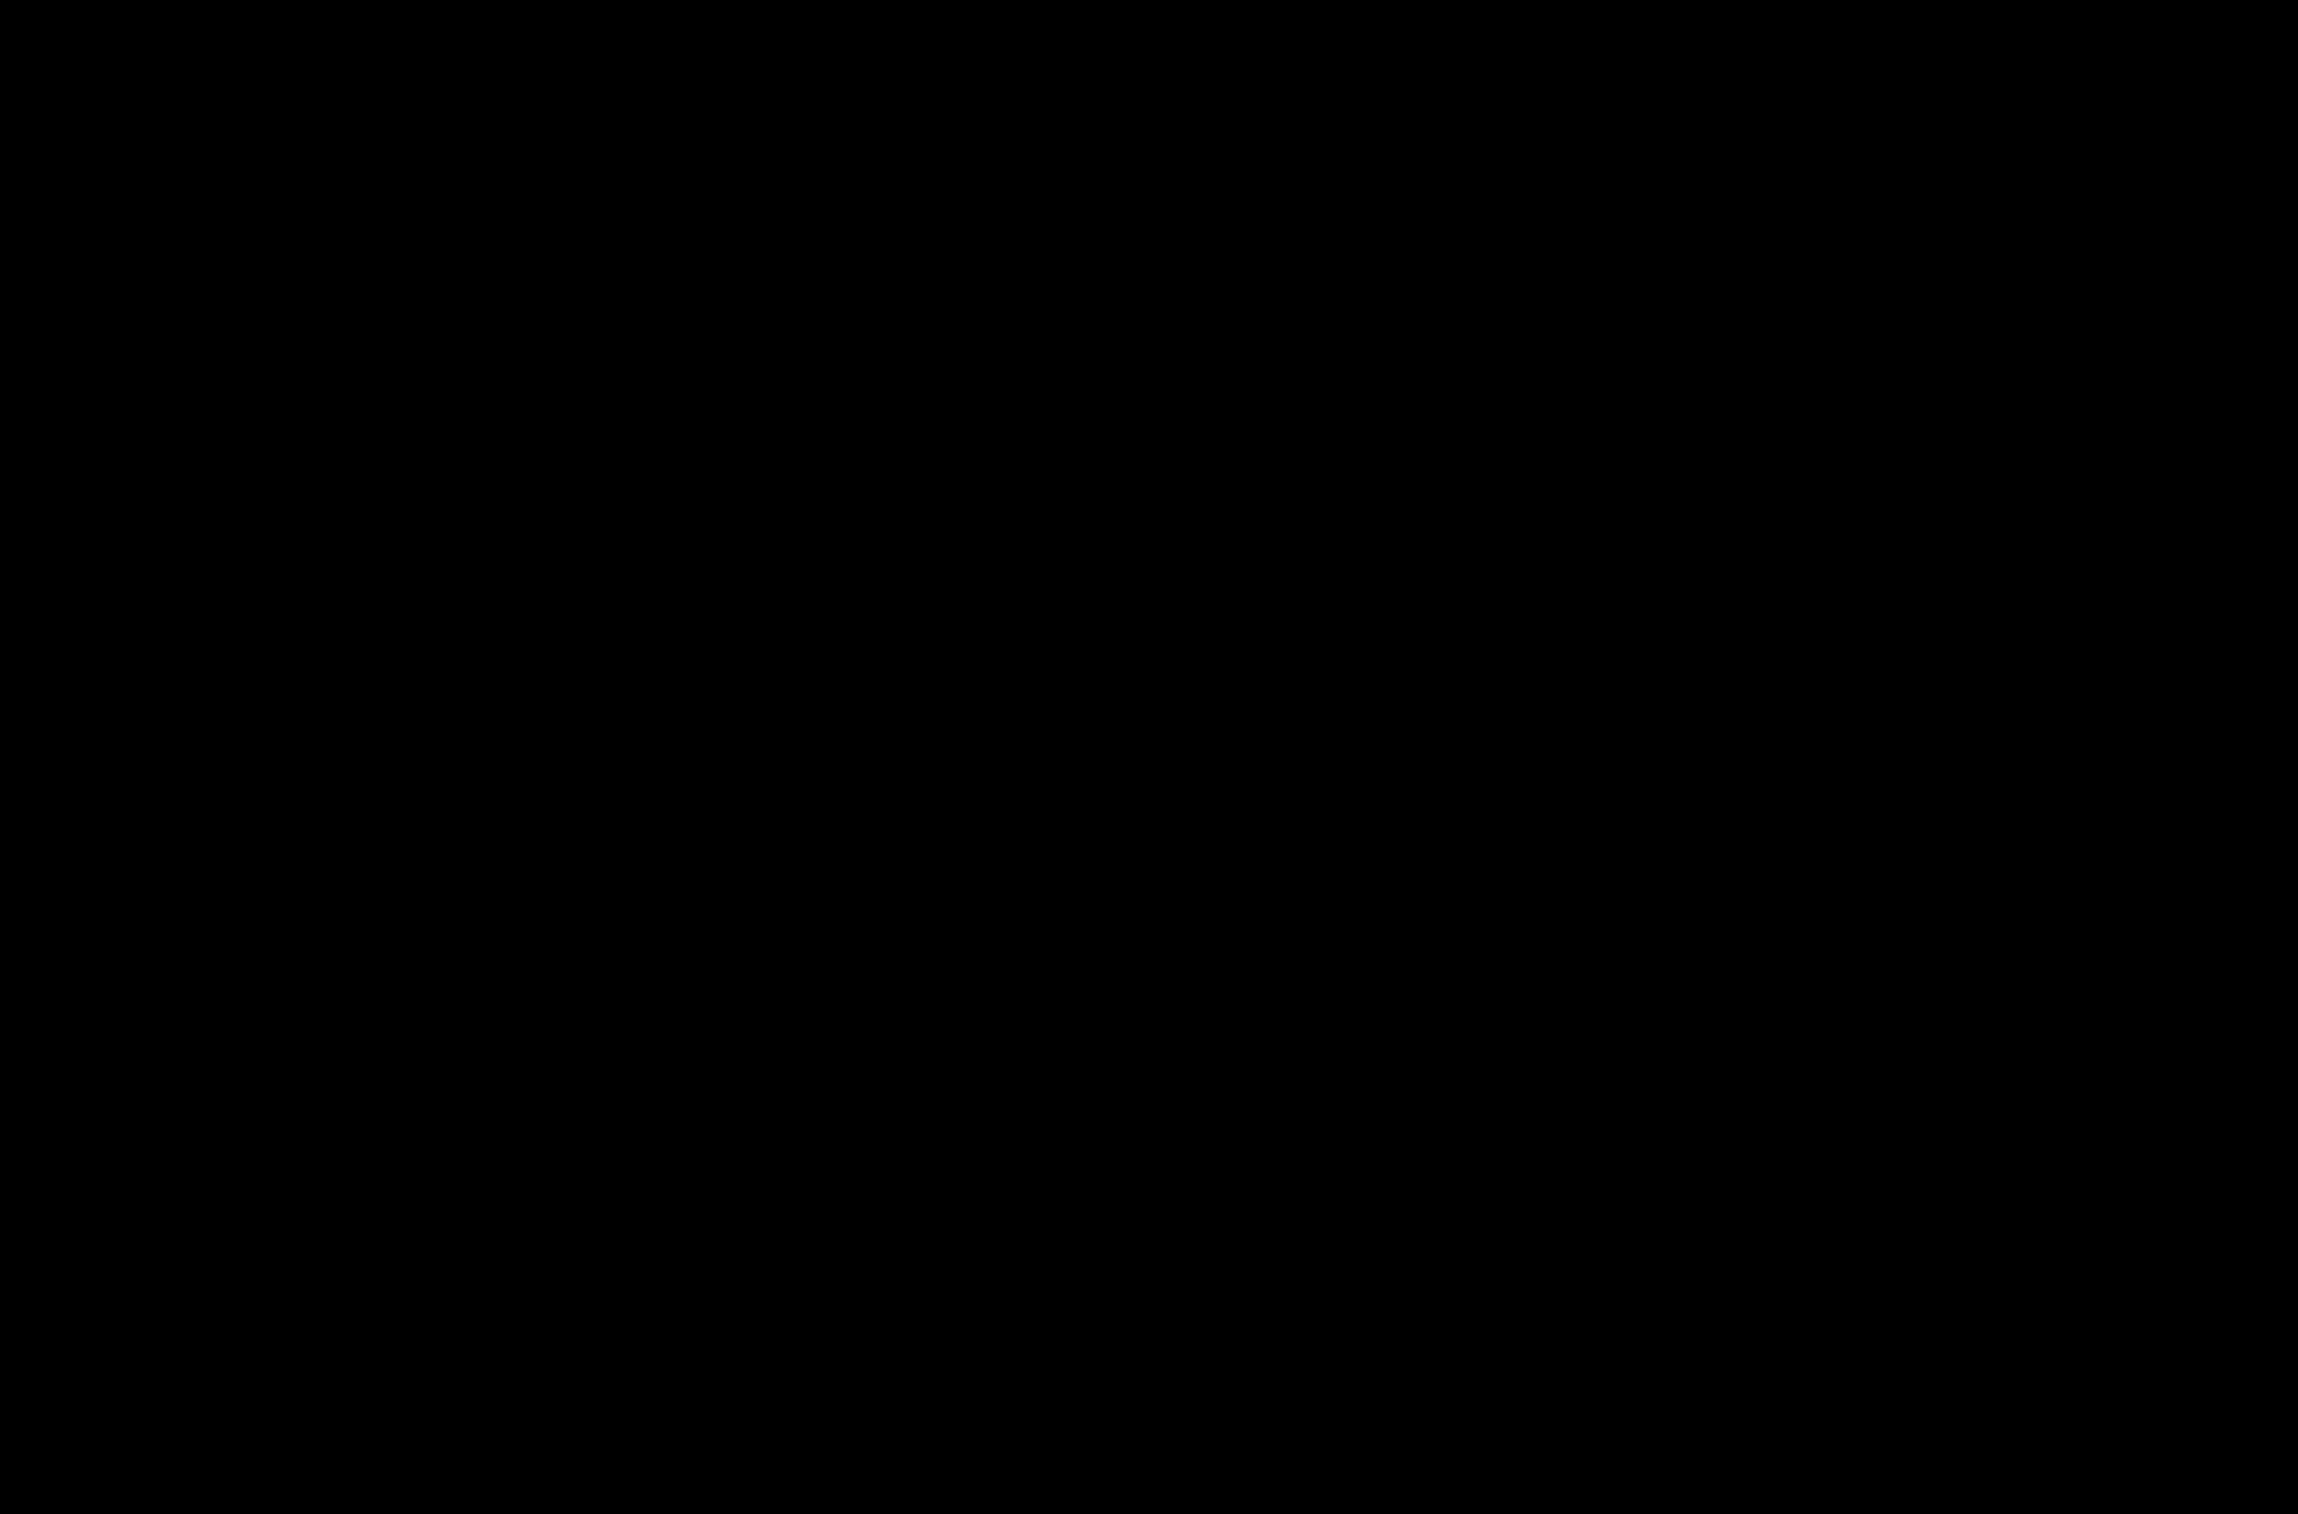 Flourish silhouette big image. Clipart butterfly swirl